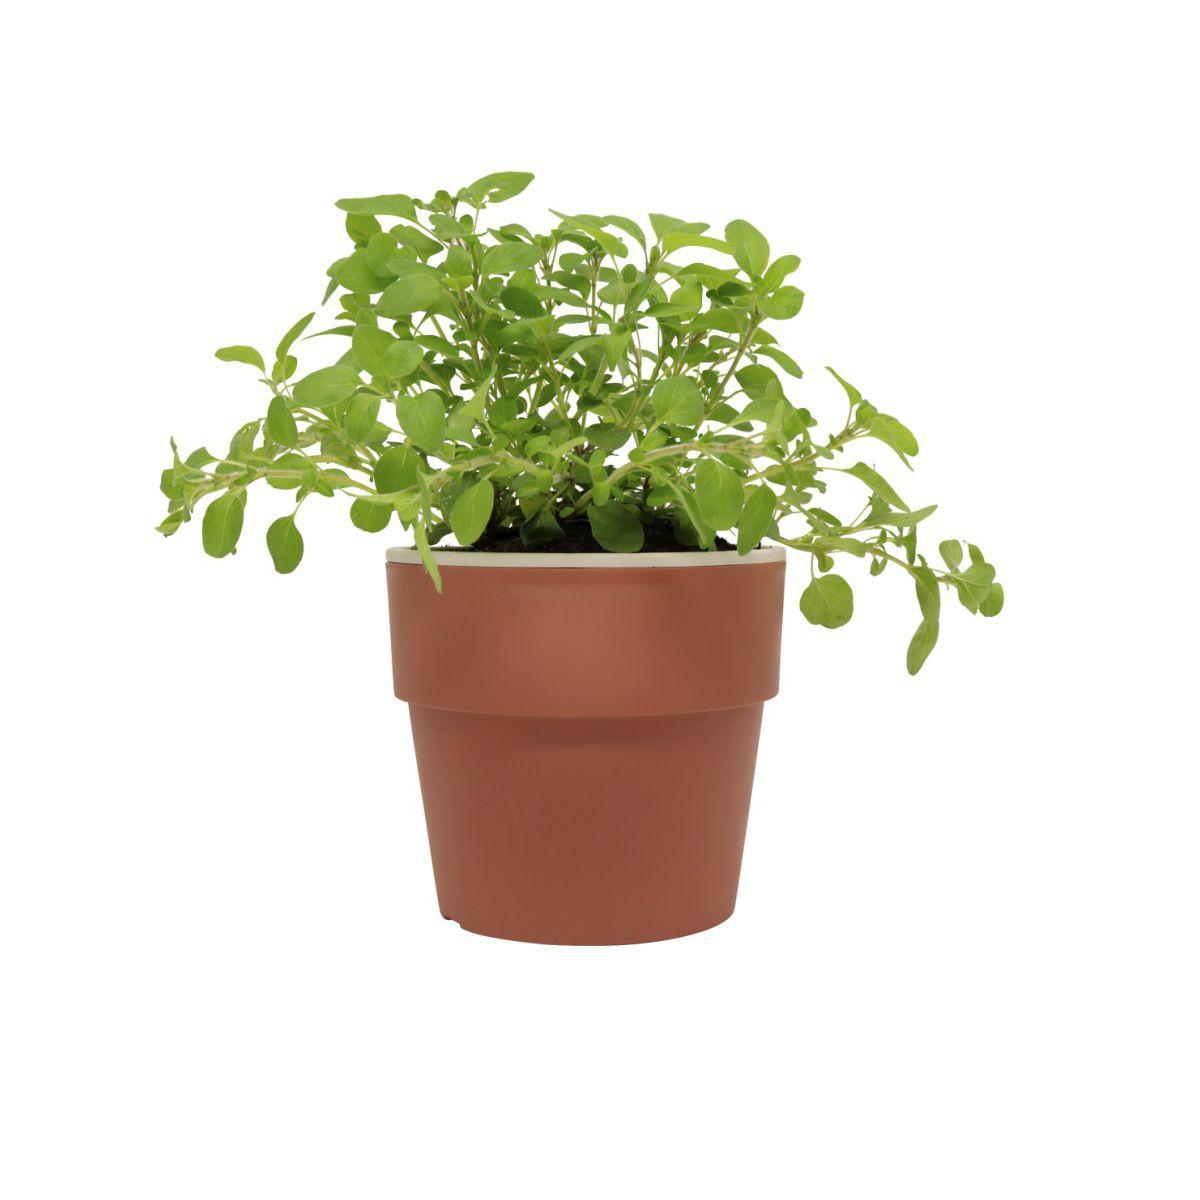 Vaso Autoirrigável Médio Terracota Linha Plantar < Ou >